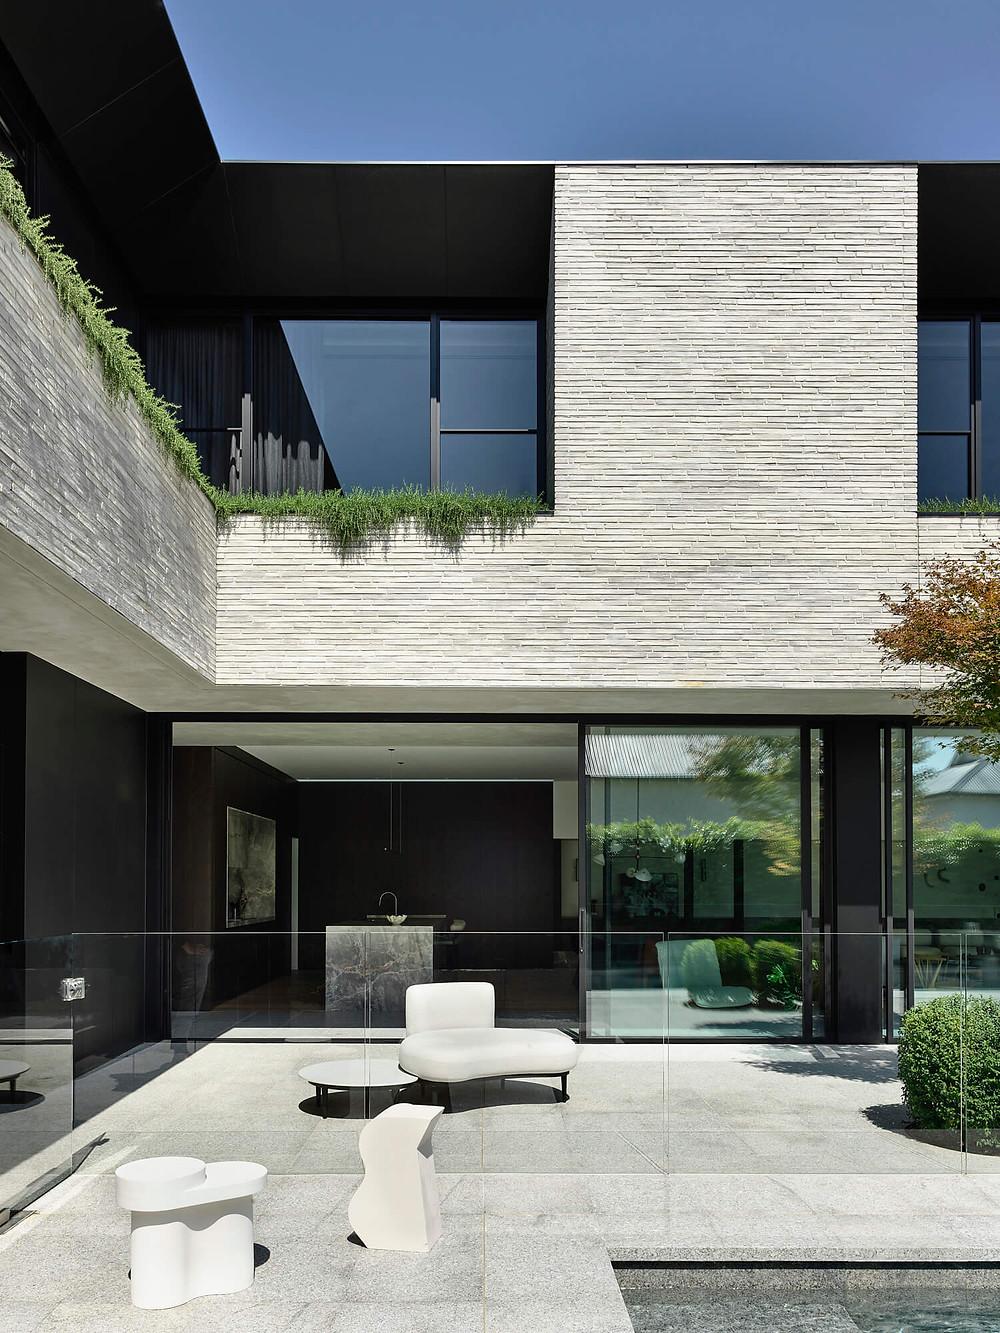 An elevated garden adds softness to the Petersen brick facade